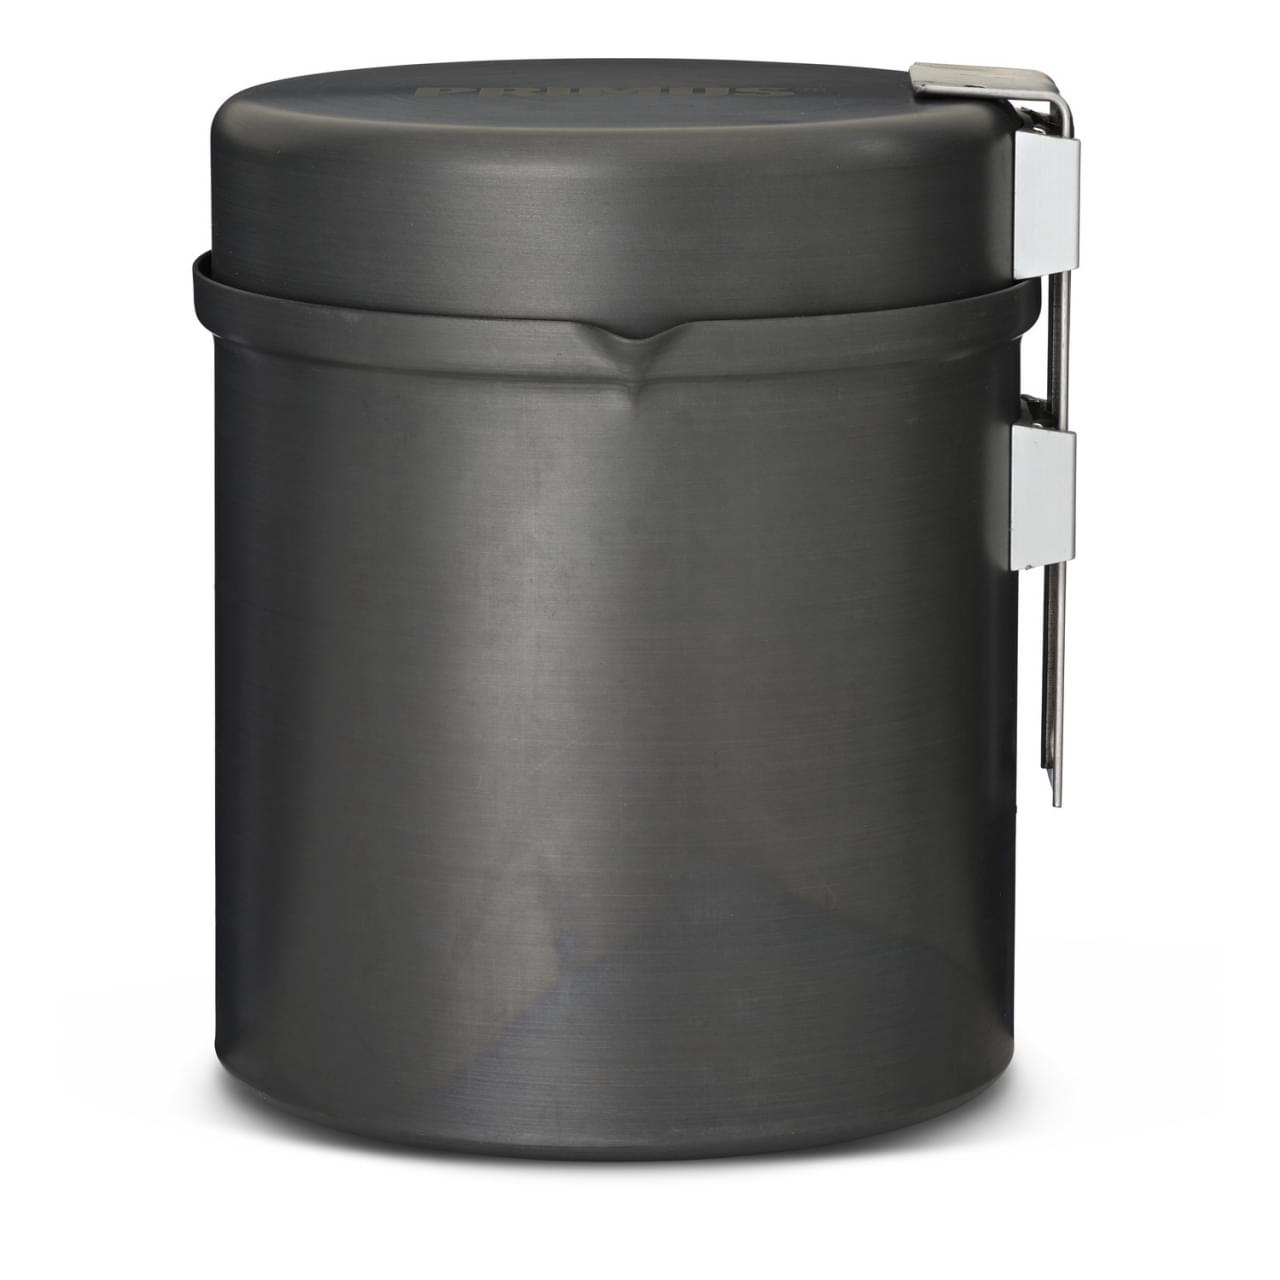 Primus Trek Pot 1.0 Pan